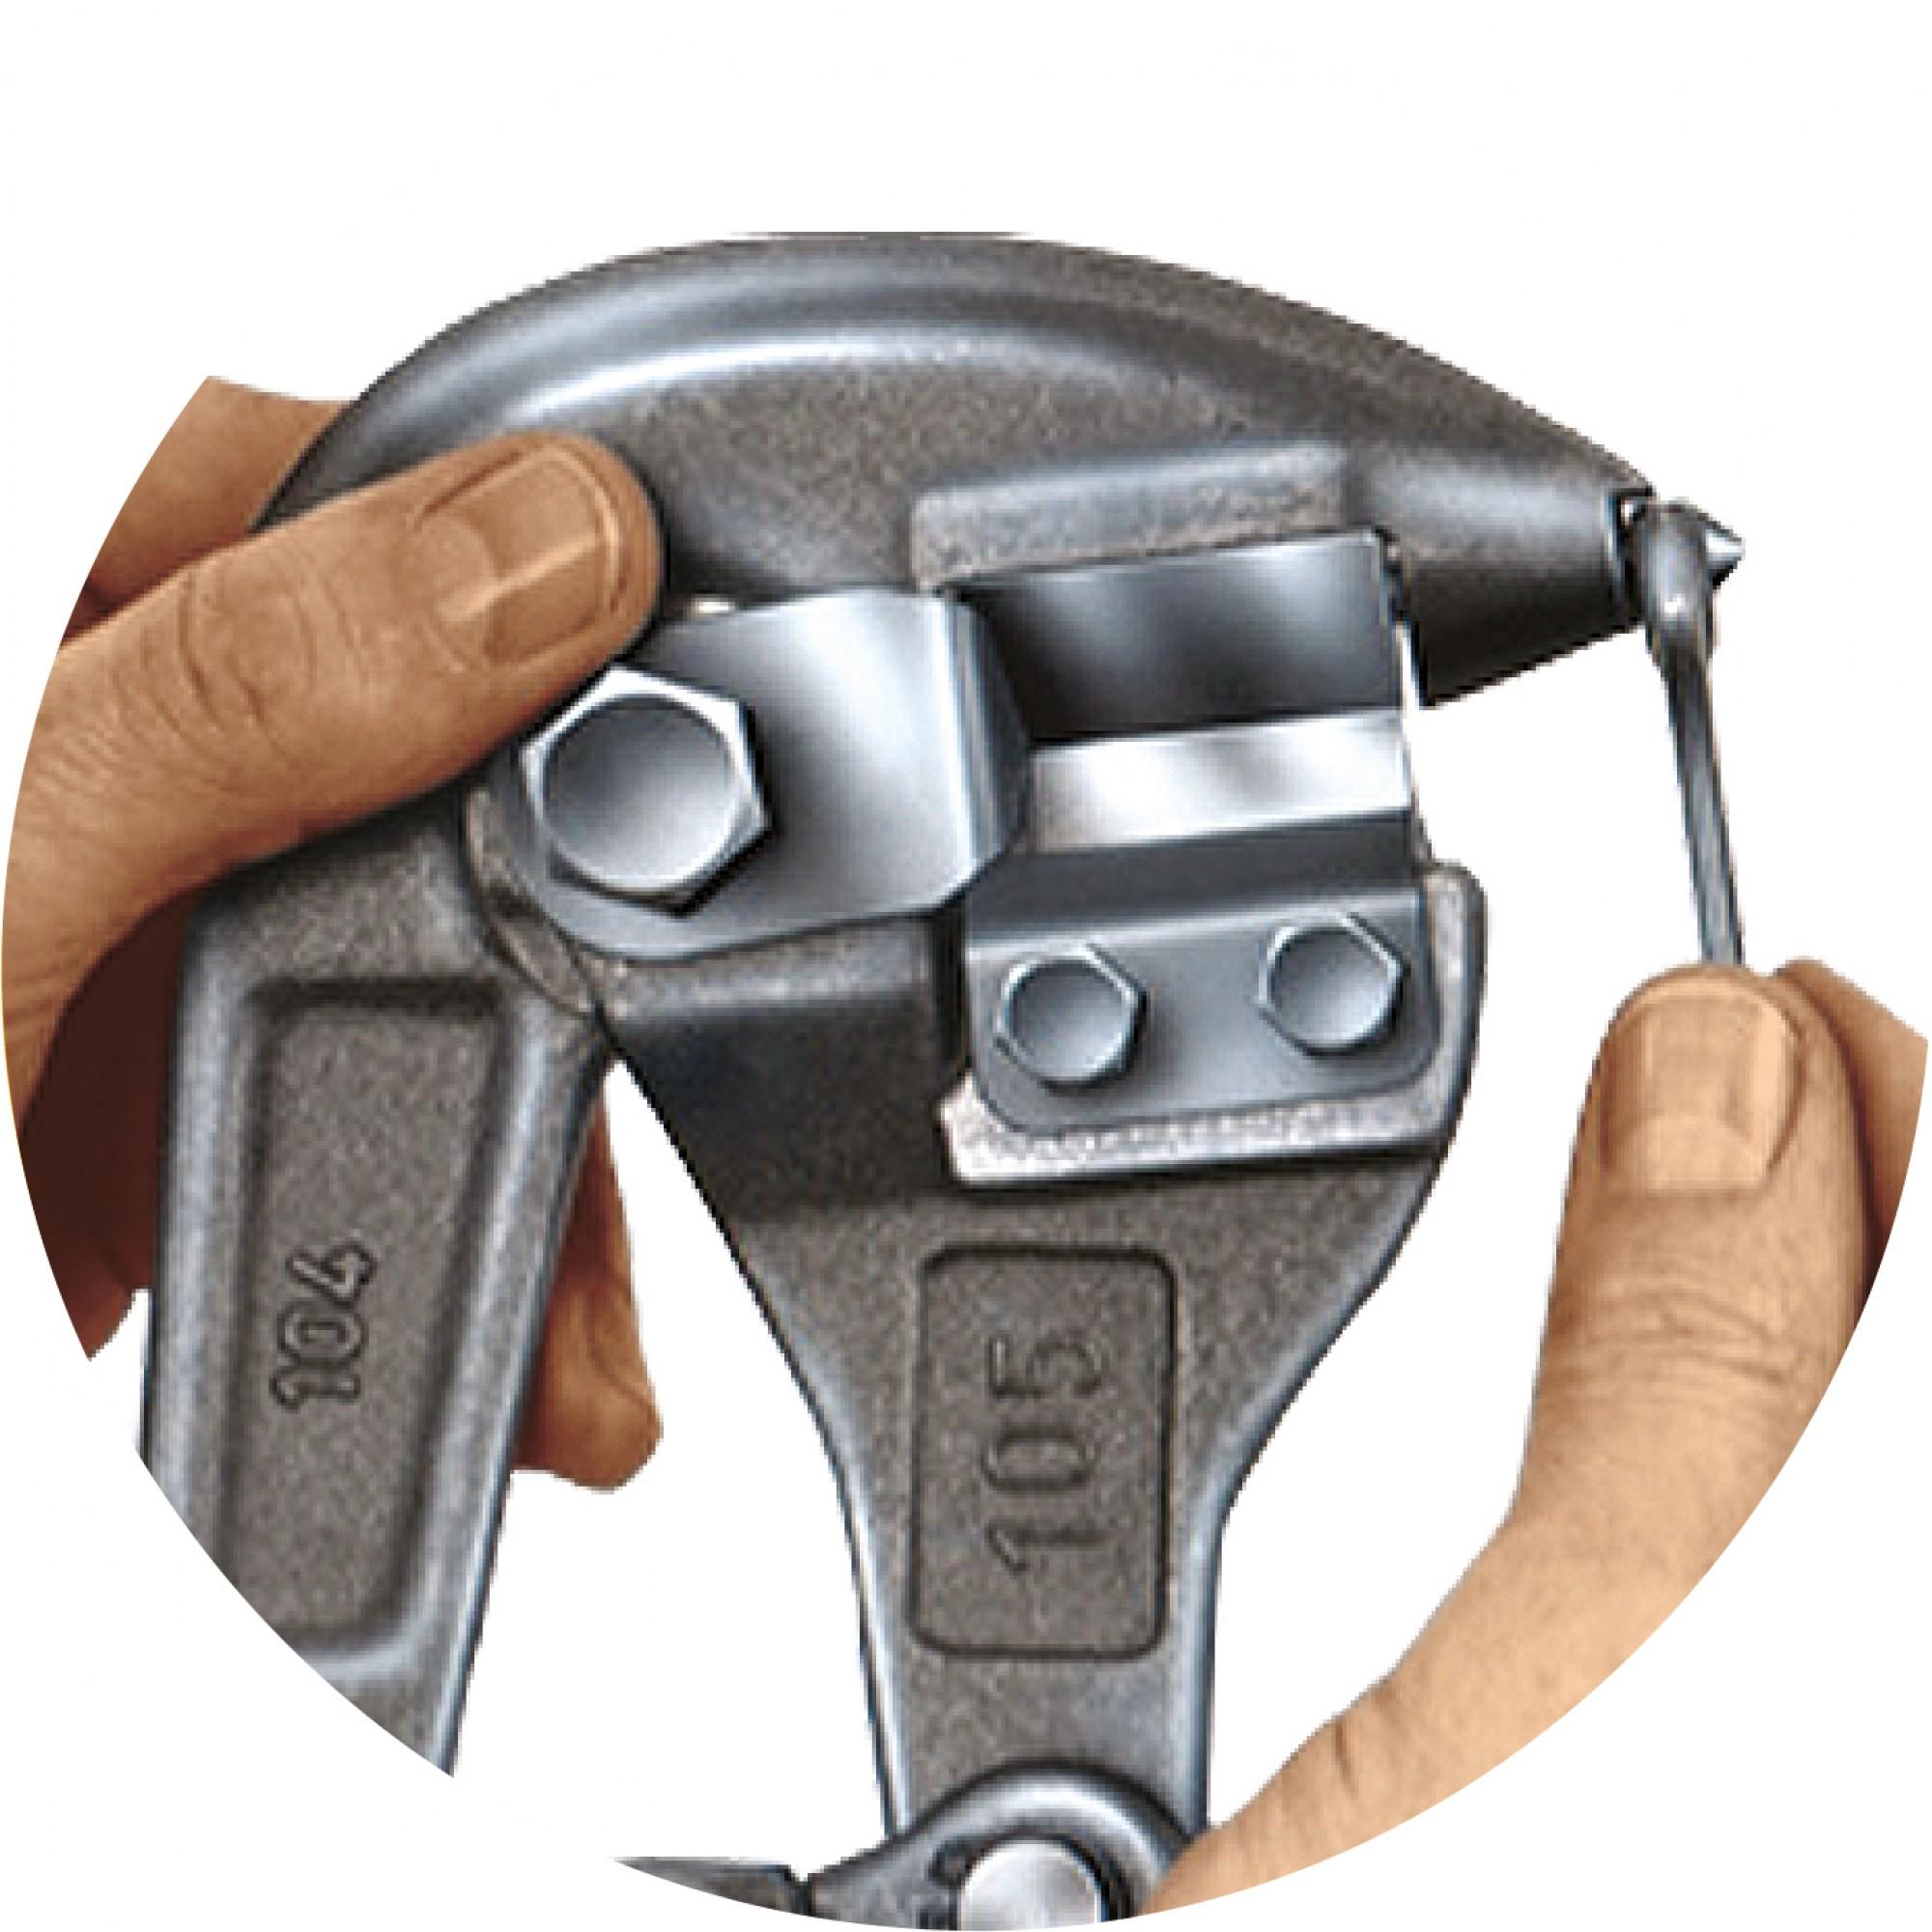 with tools cutting and cutters dexter mat pin supplies no cutter mats